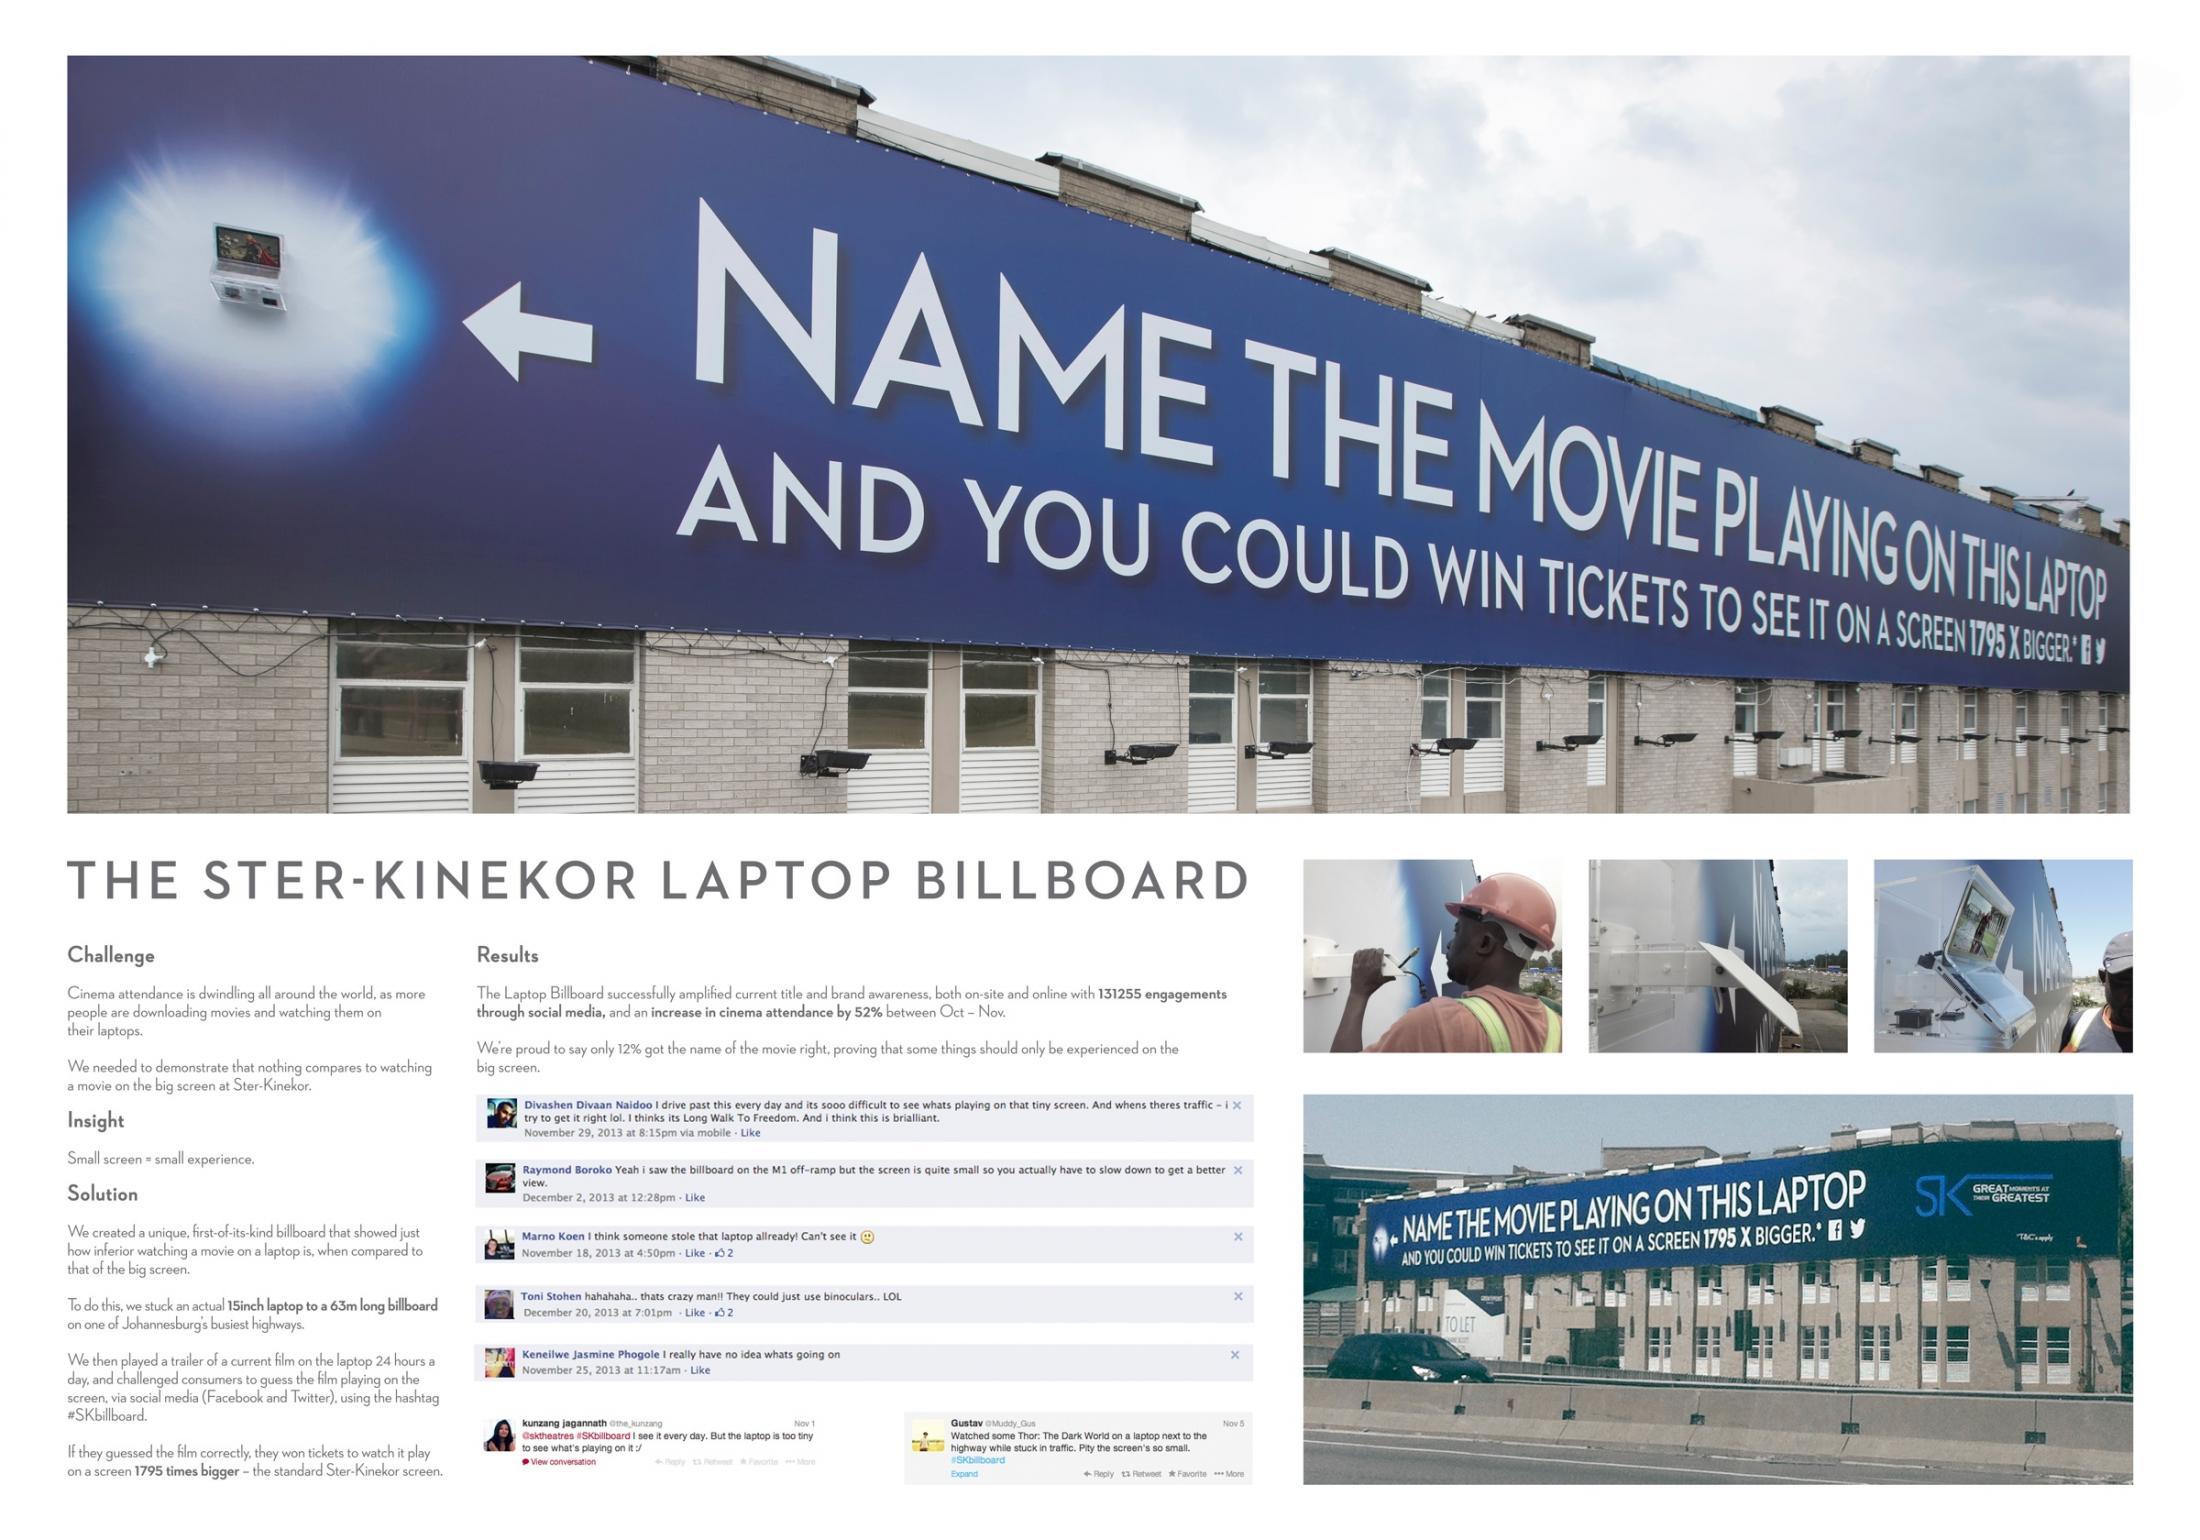 Ster-Kinekor Outdoor Ad -  The Laptop Billboard